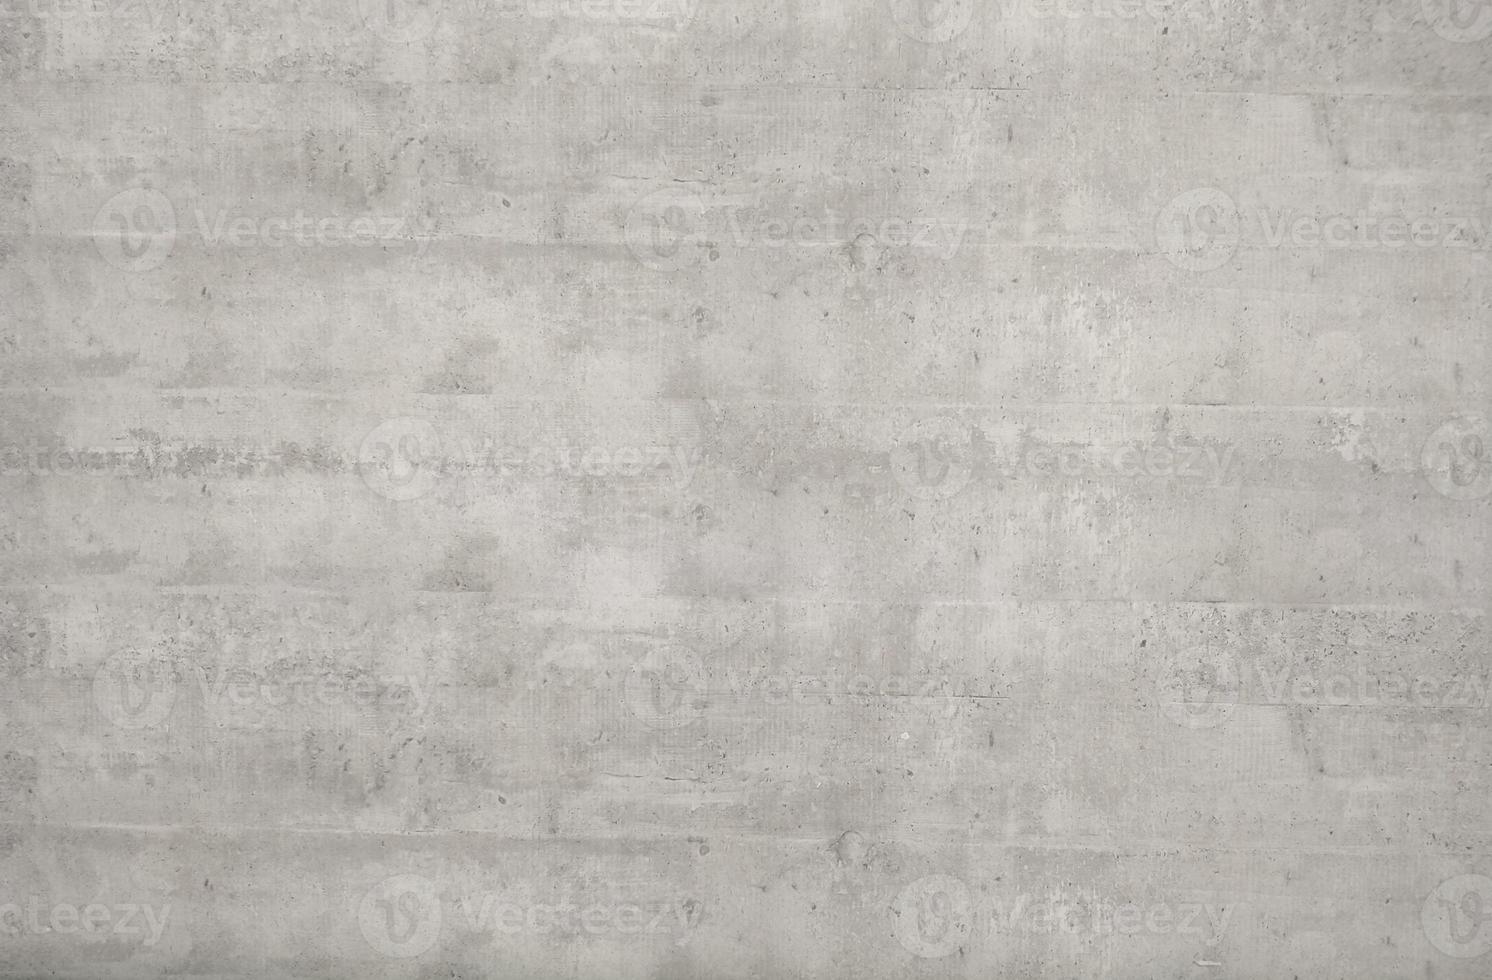 fundo de textura de concreto branco de cimento natural ou textura de pedra velha. foto